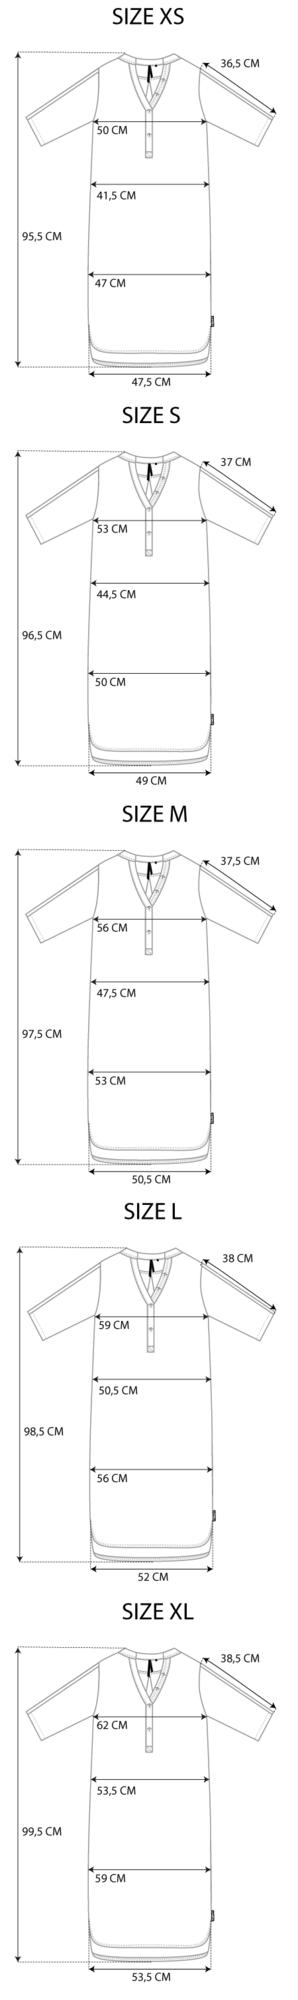 Maattabel Travel Tunic Robe